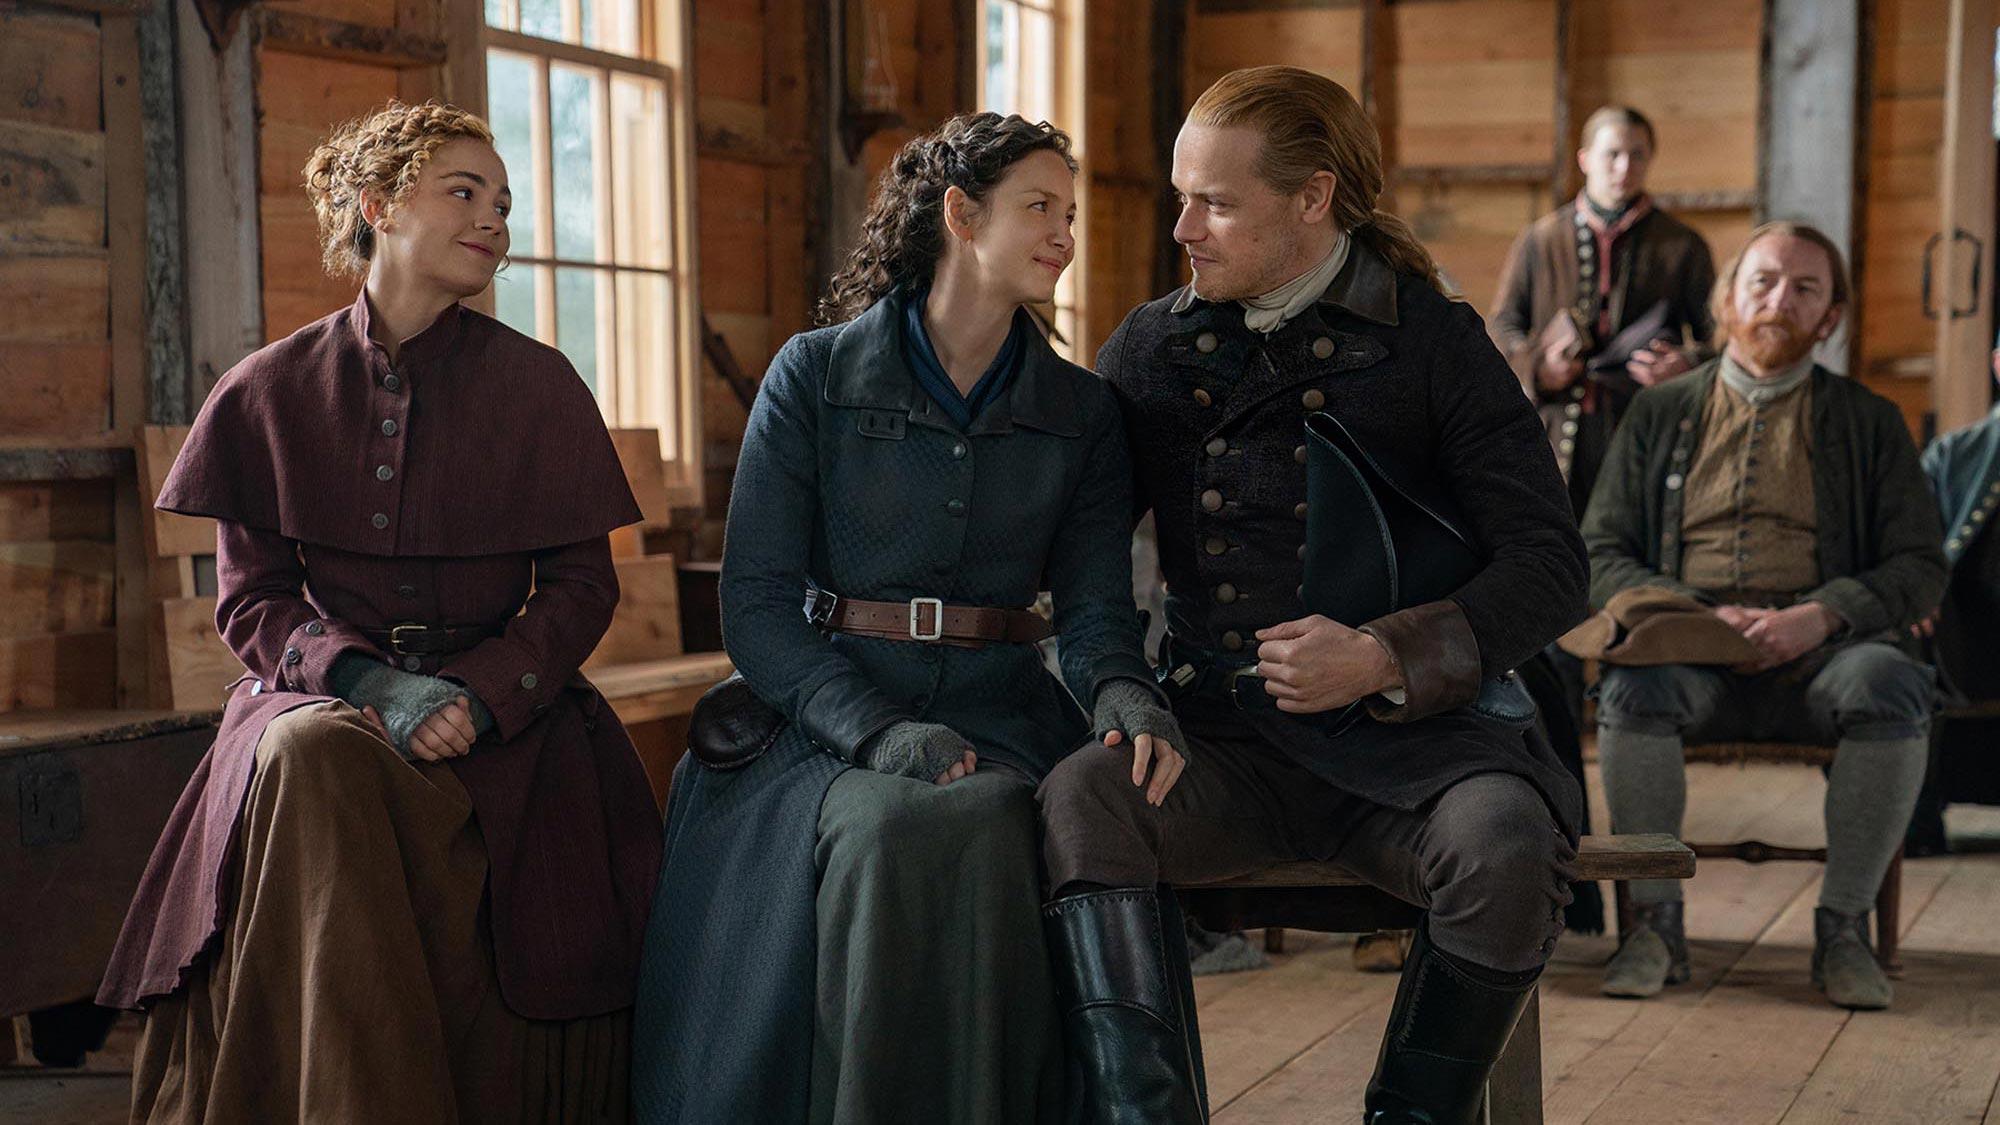 Outlander season 6 photo: Brianna, Claire, Jamie Fraser